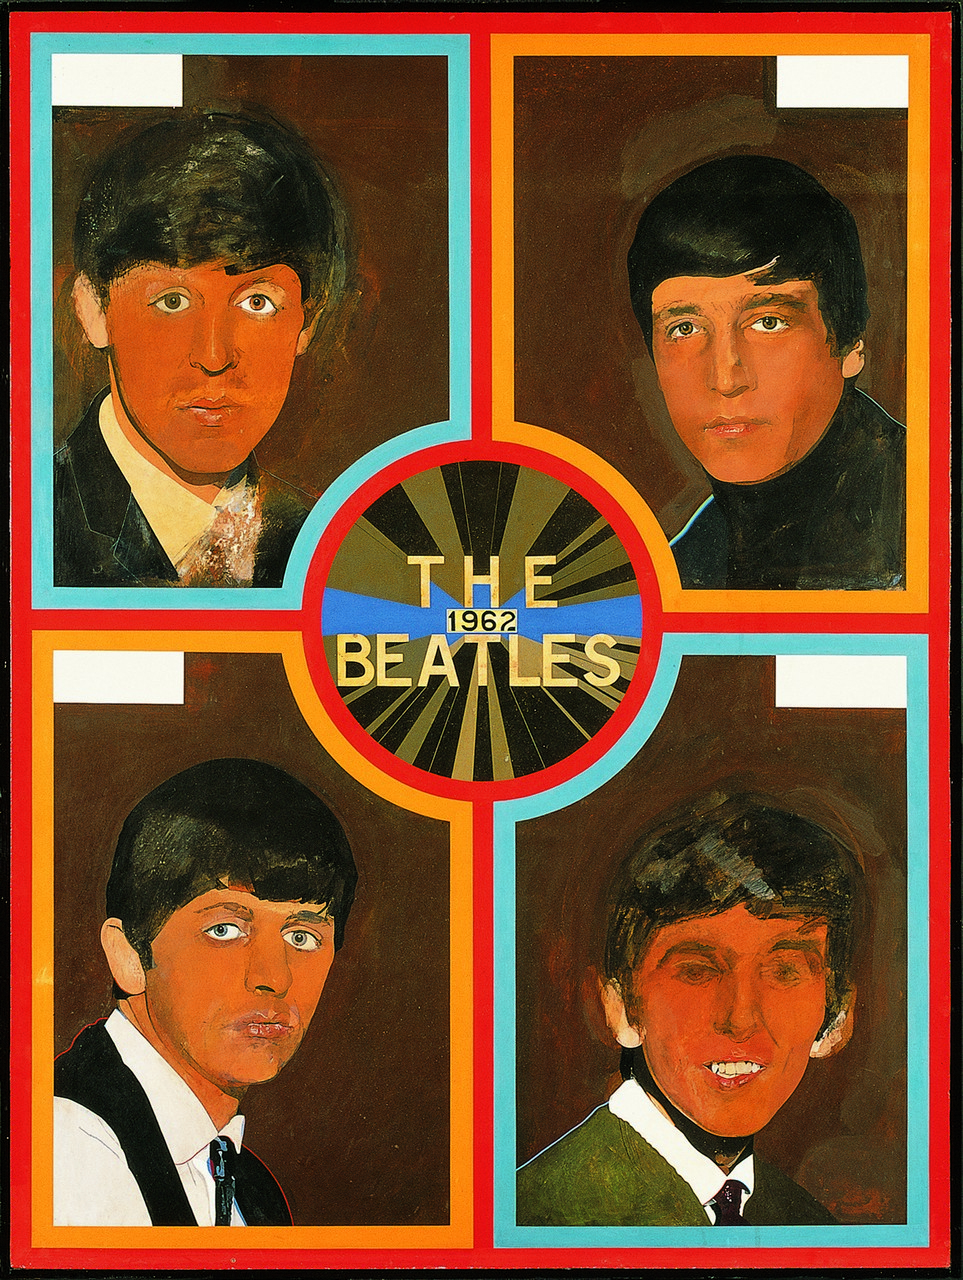 Sir Peter Blake (b.1932) - The Beatles, 1962, 2012, 20 colour screen print, printed on Somerset